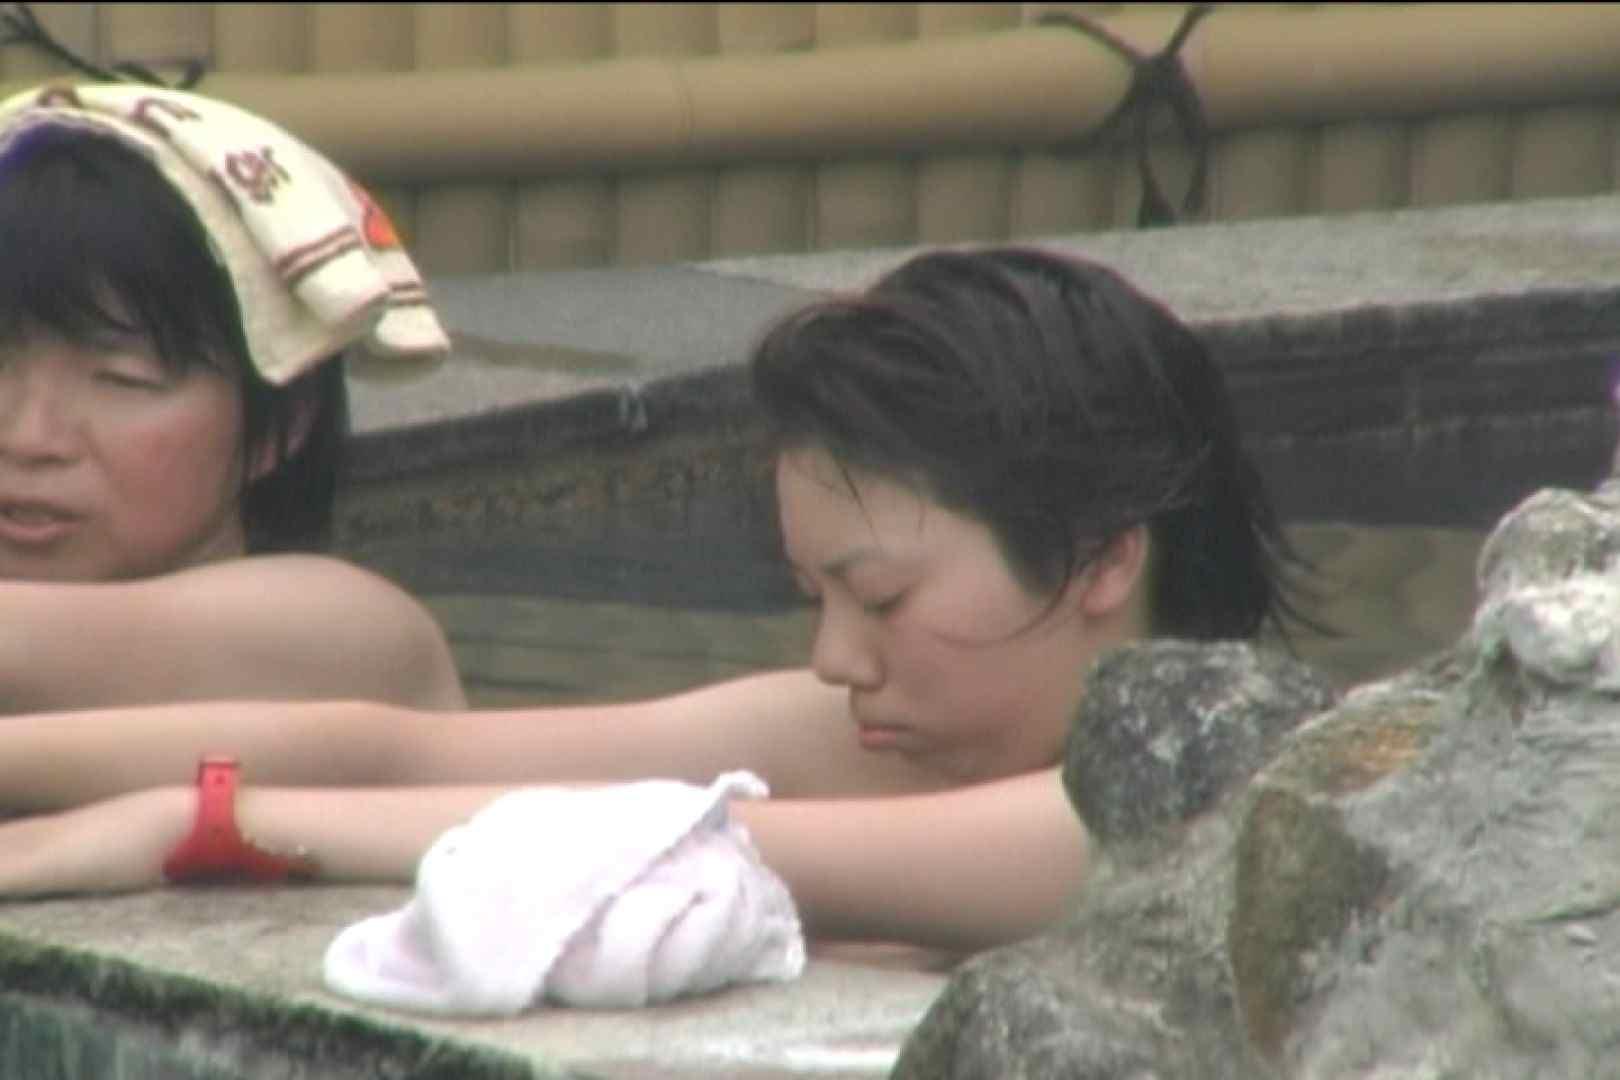 Aquaな露天風呂Vol.122 エッチな盗撮 オメコ無修正動画無料 107pic 10